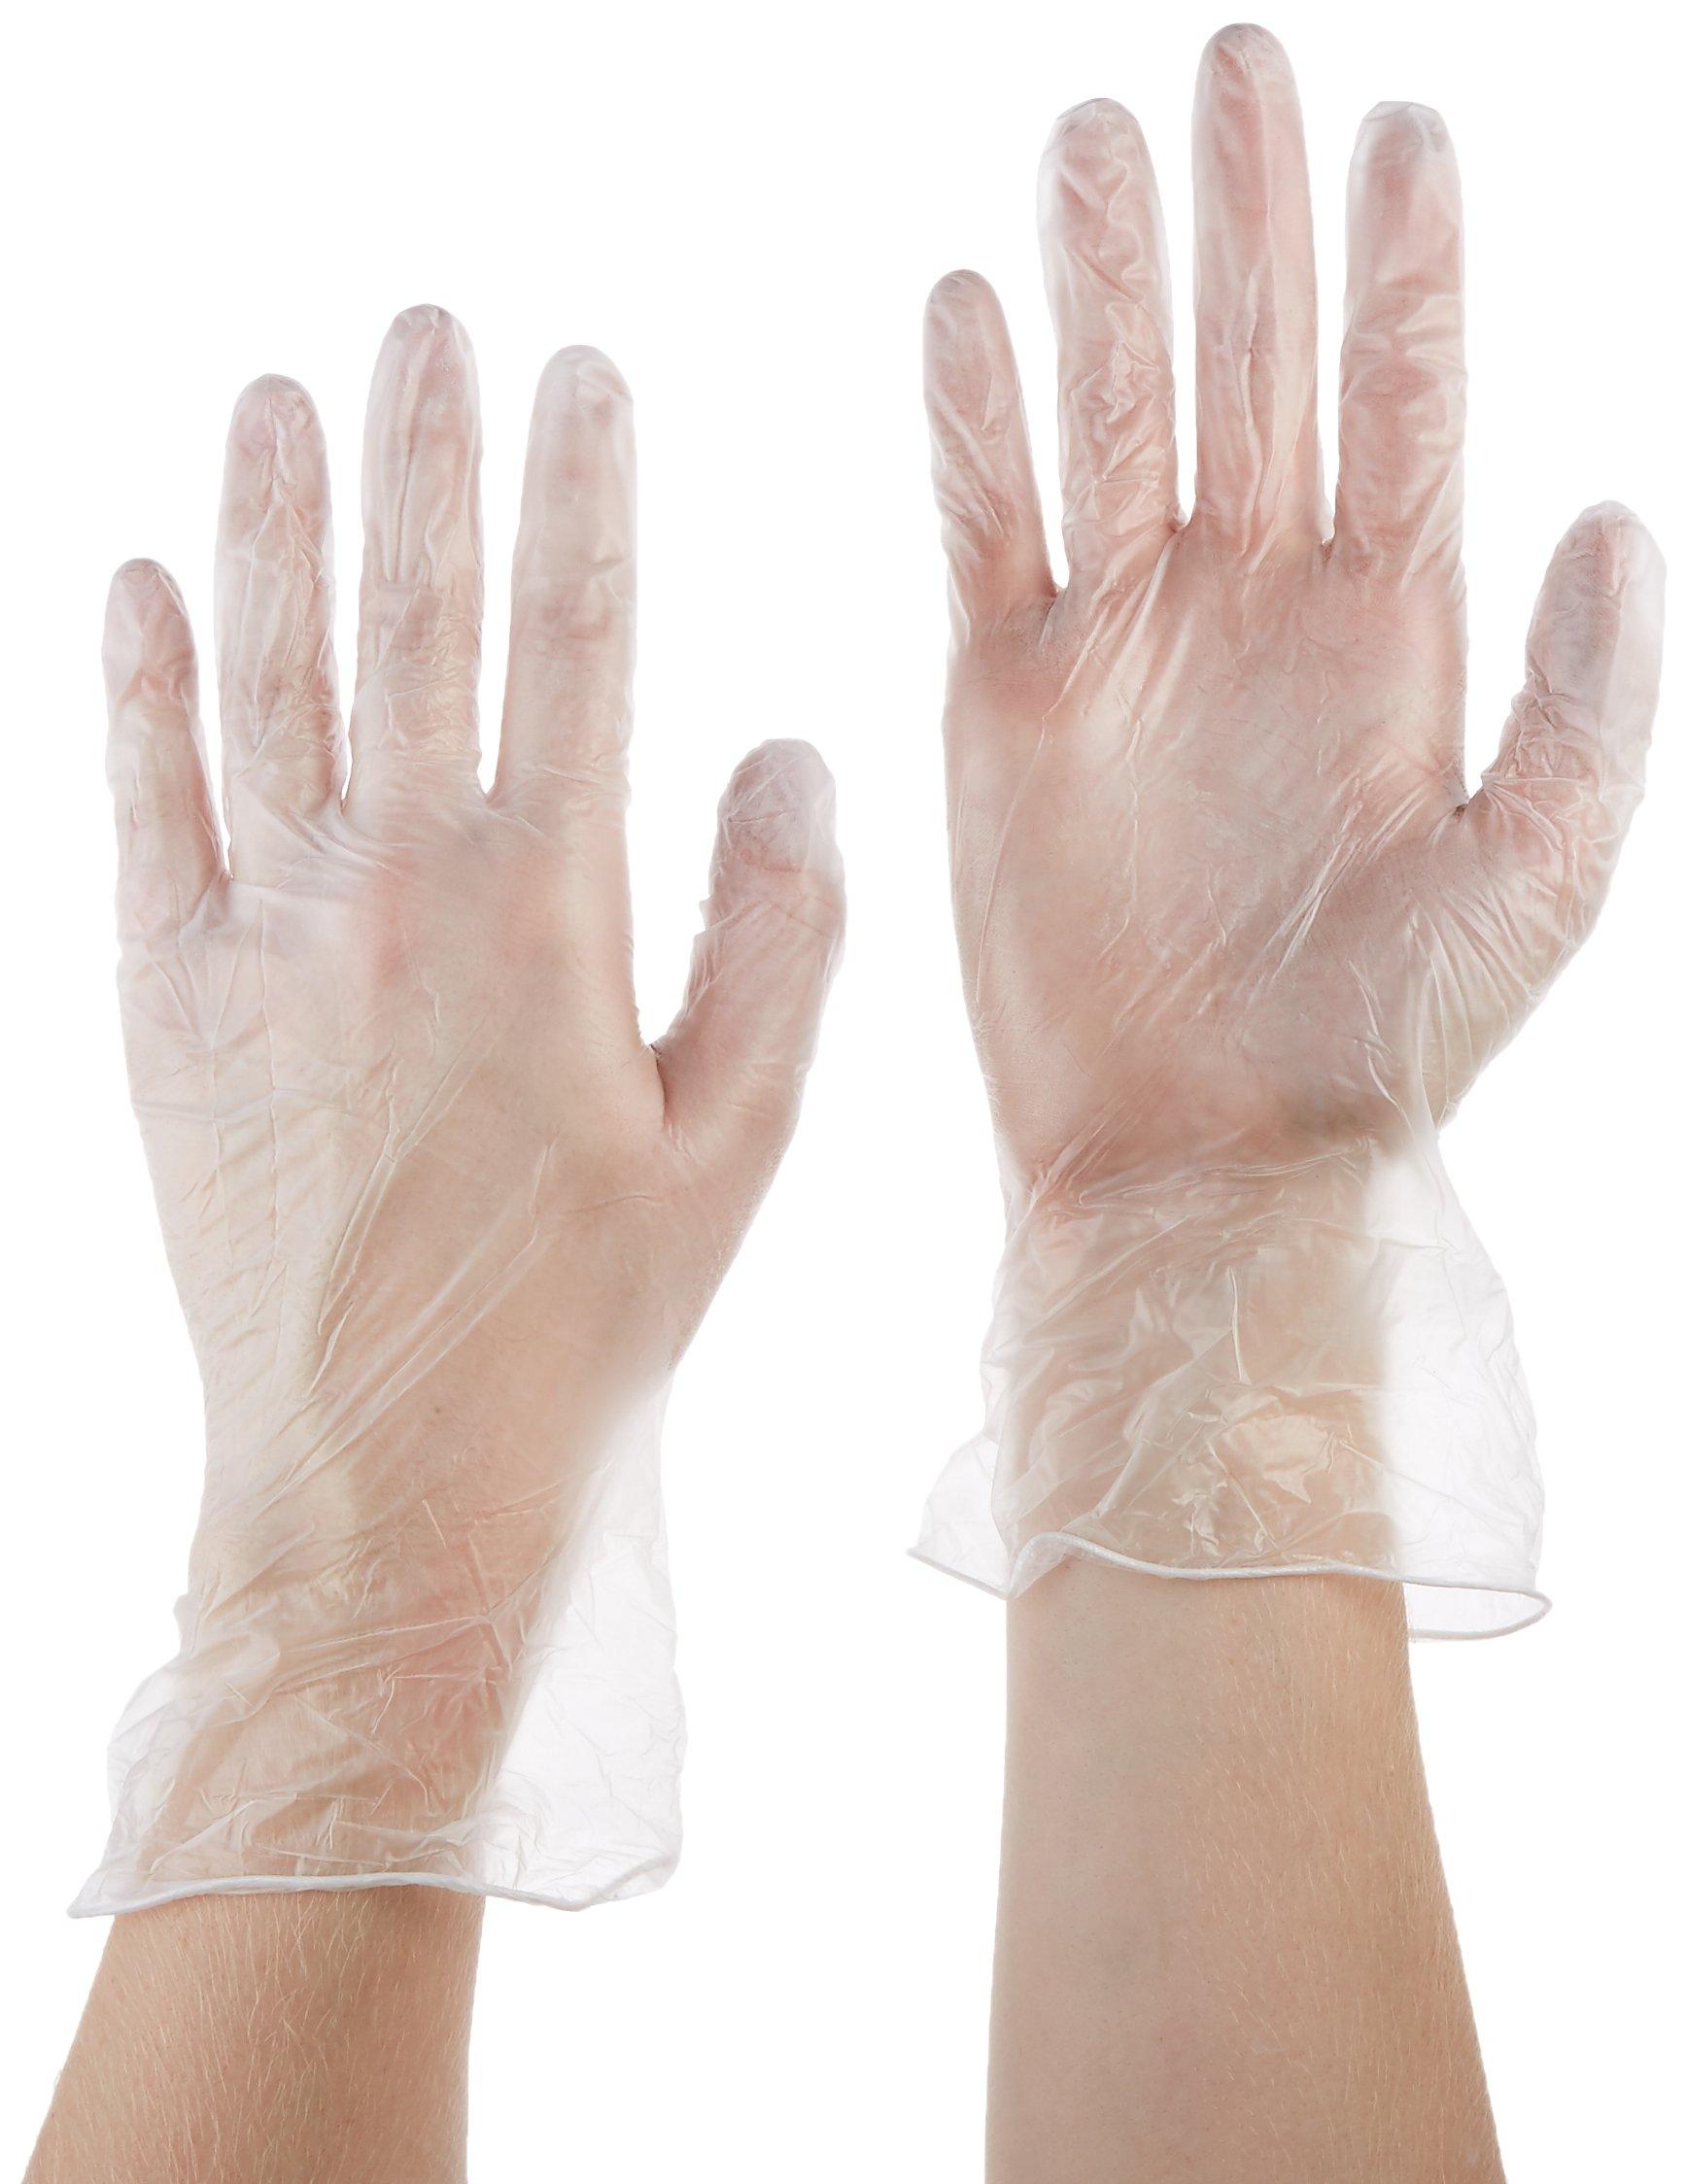 Tradex VMD5101 Ambitex Vinyl Powdered Multi-Purpose Gloves, Medium, Clear (Pack of 1000) by Tradex